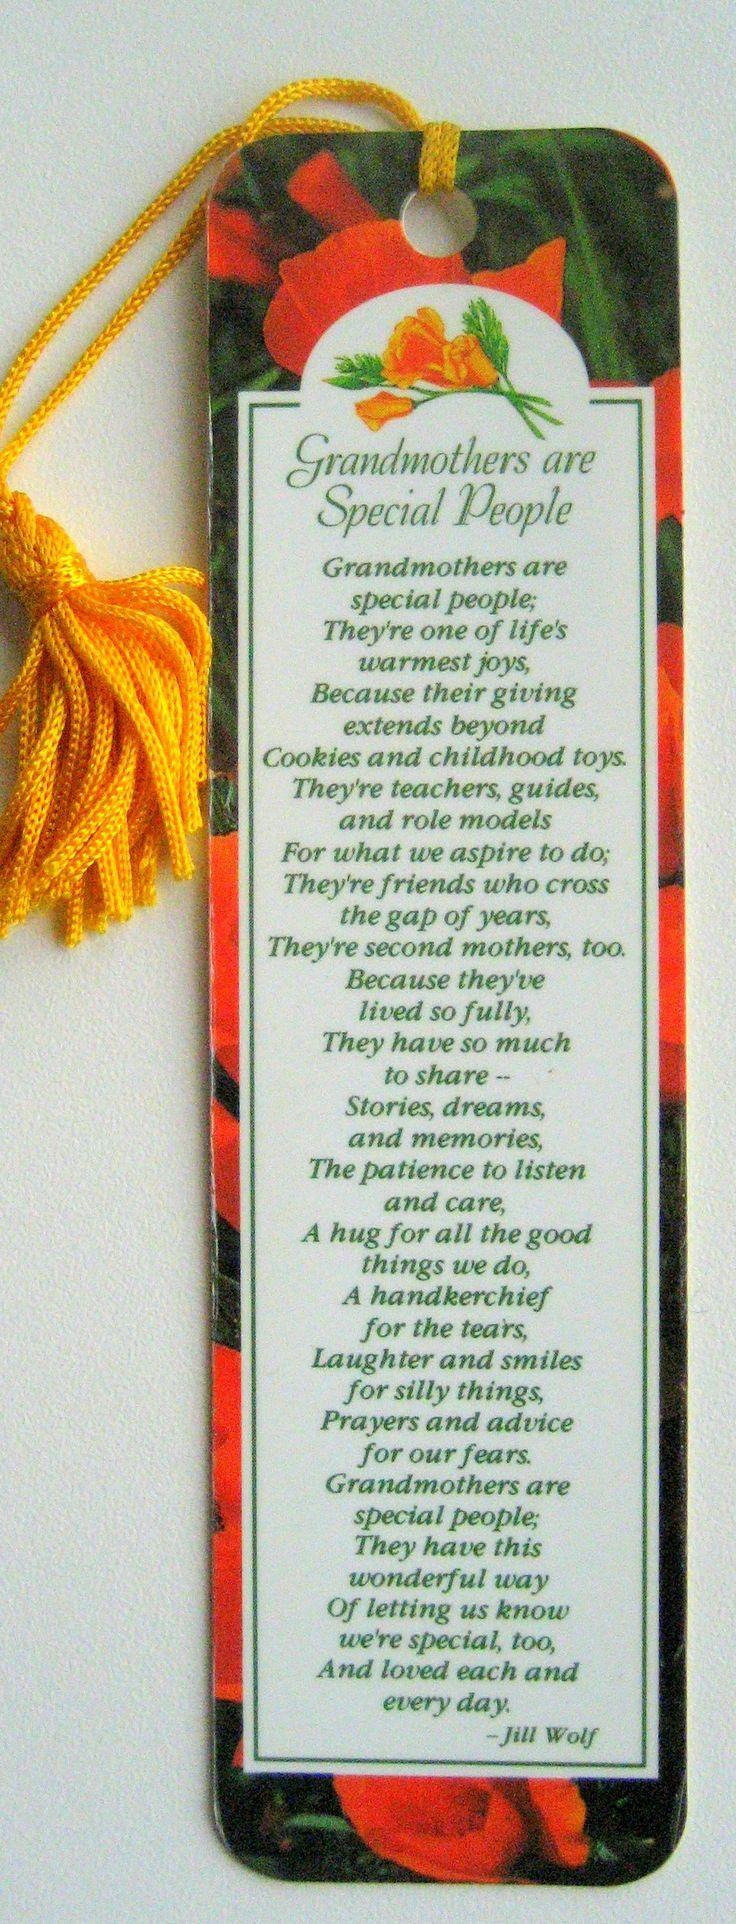 Grandmother Poems - Poem Pile